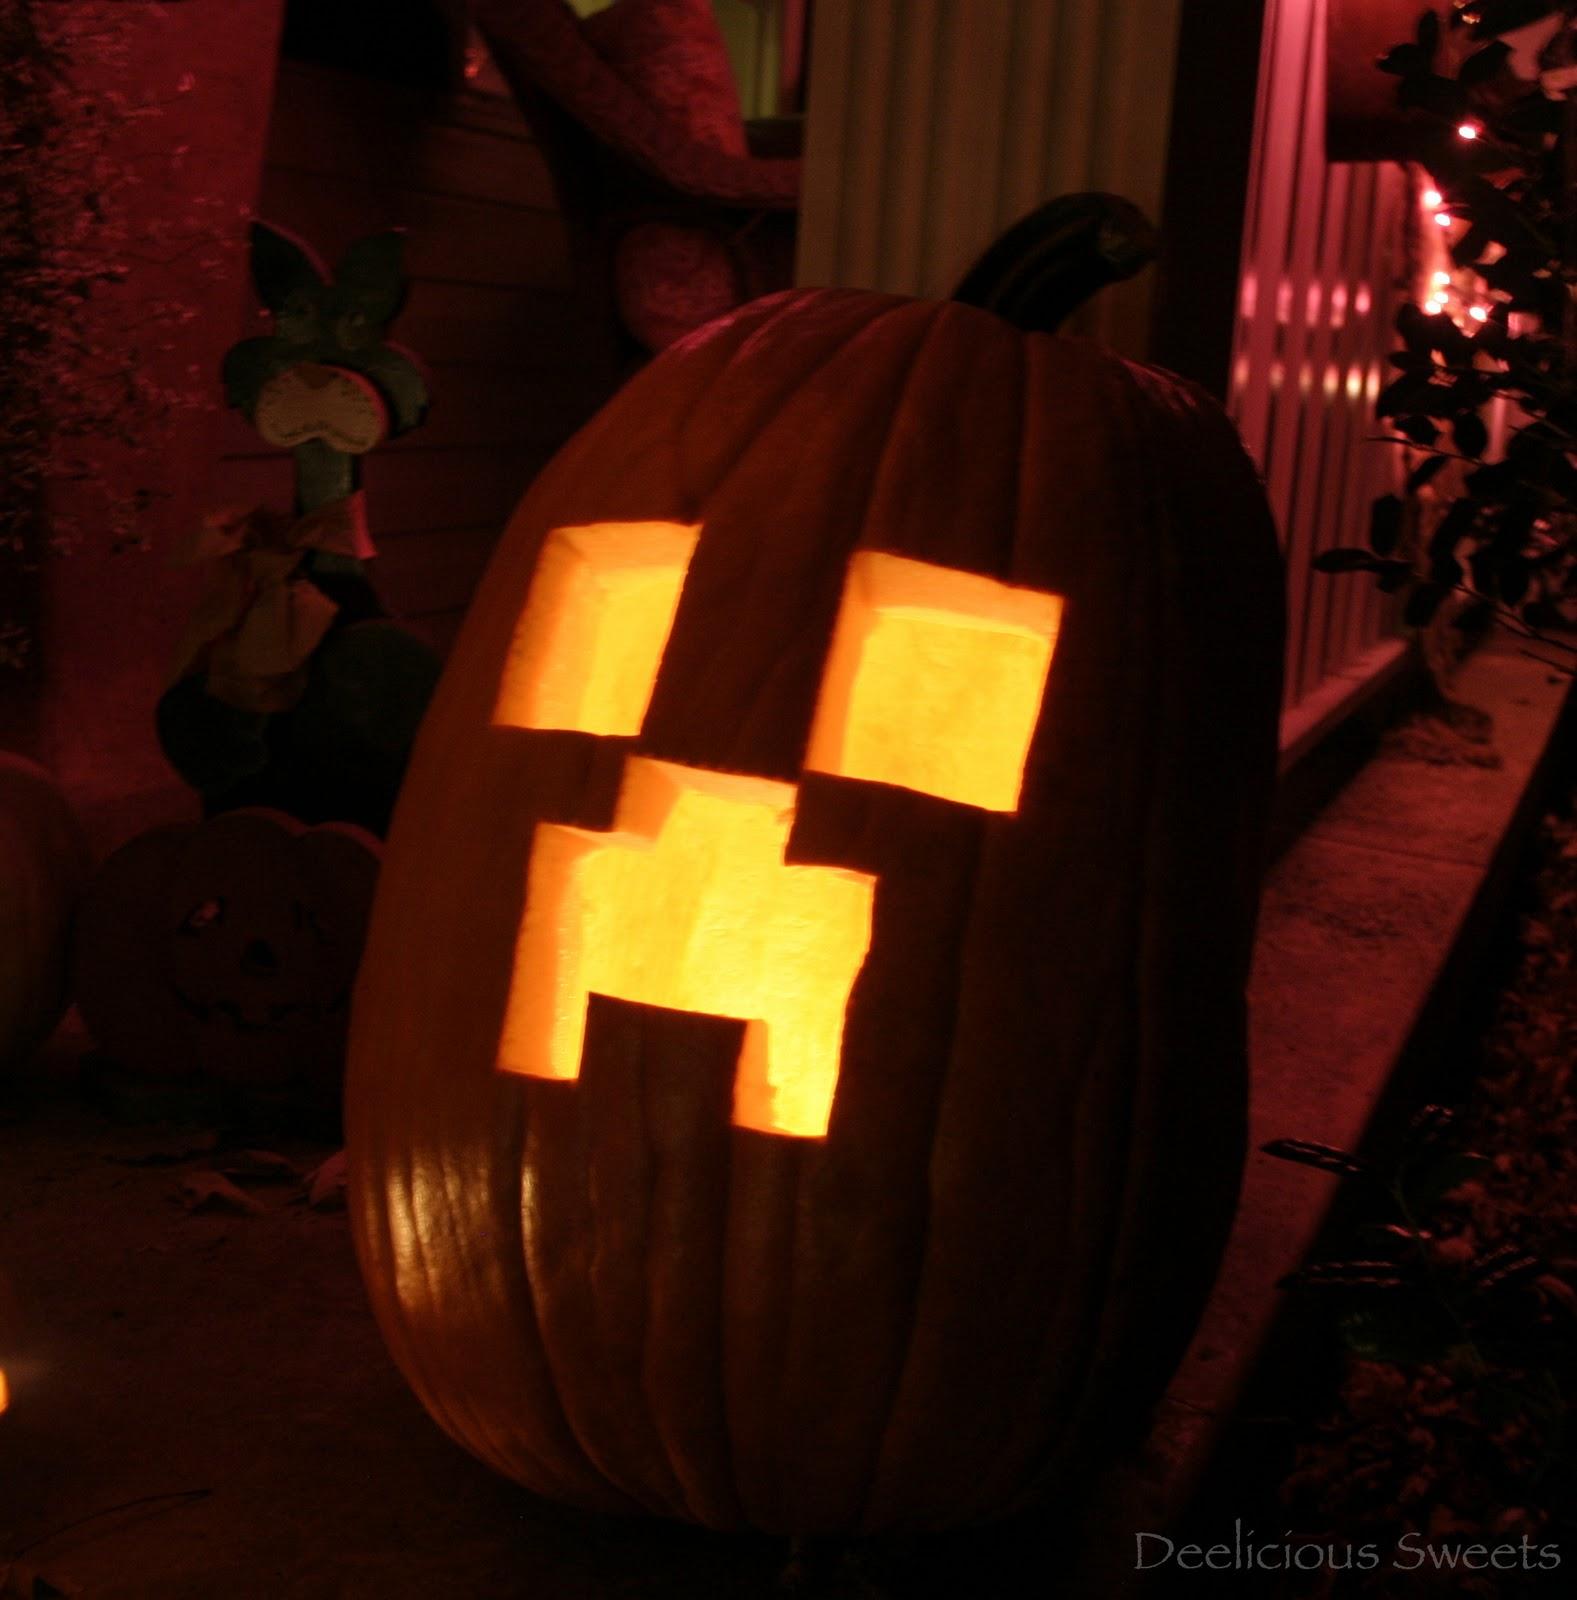 Deelicious Sweets Pumpkin Carving And Seed Roasting JPG 1577x1600 Minecraft Designs